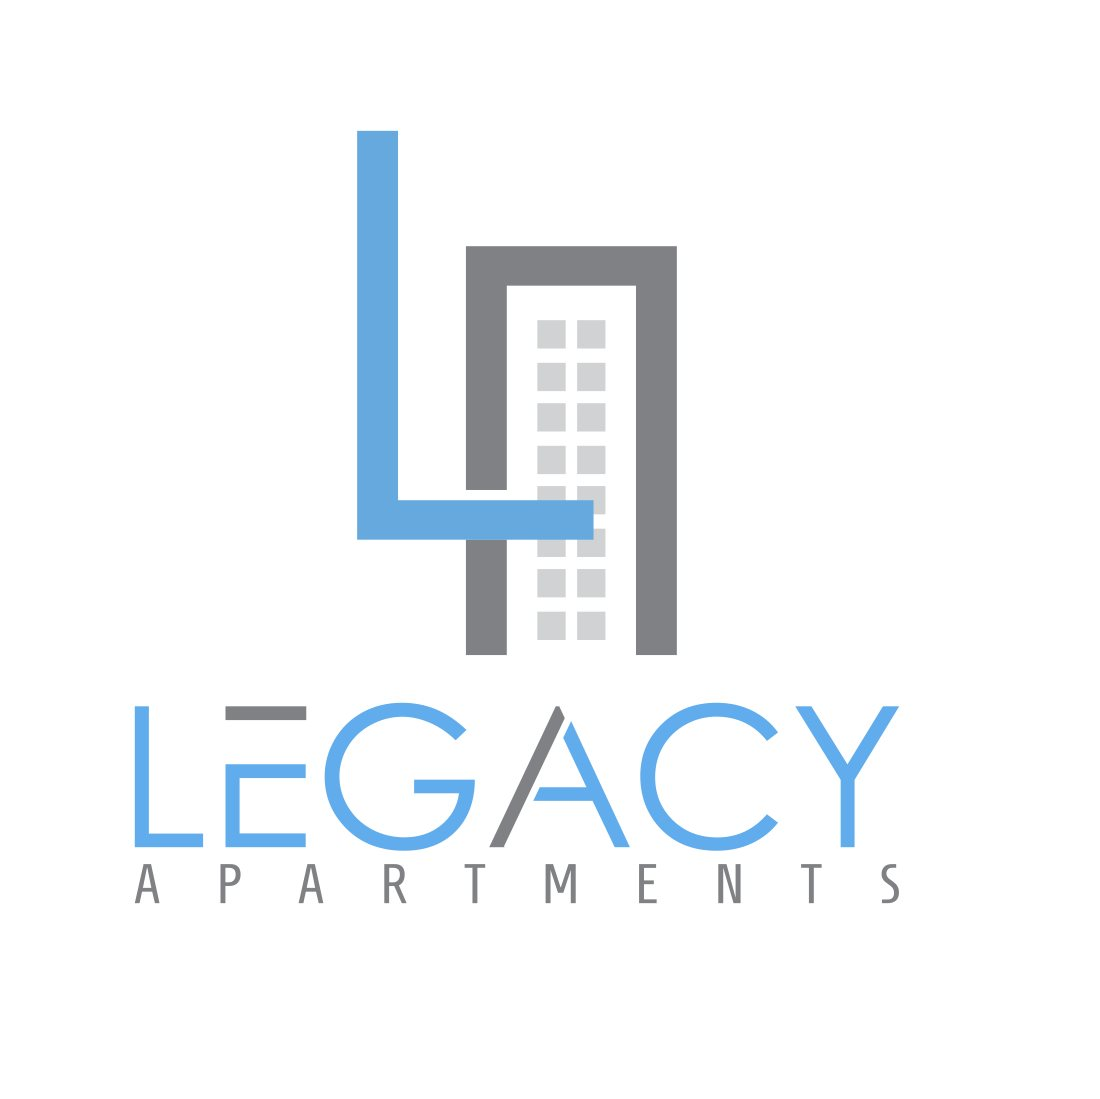 Legacy Apartment Homes  - Northridge - Luxury Rental Apartments near CSUN